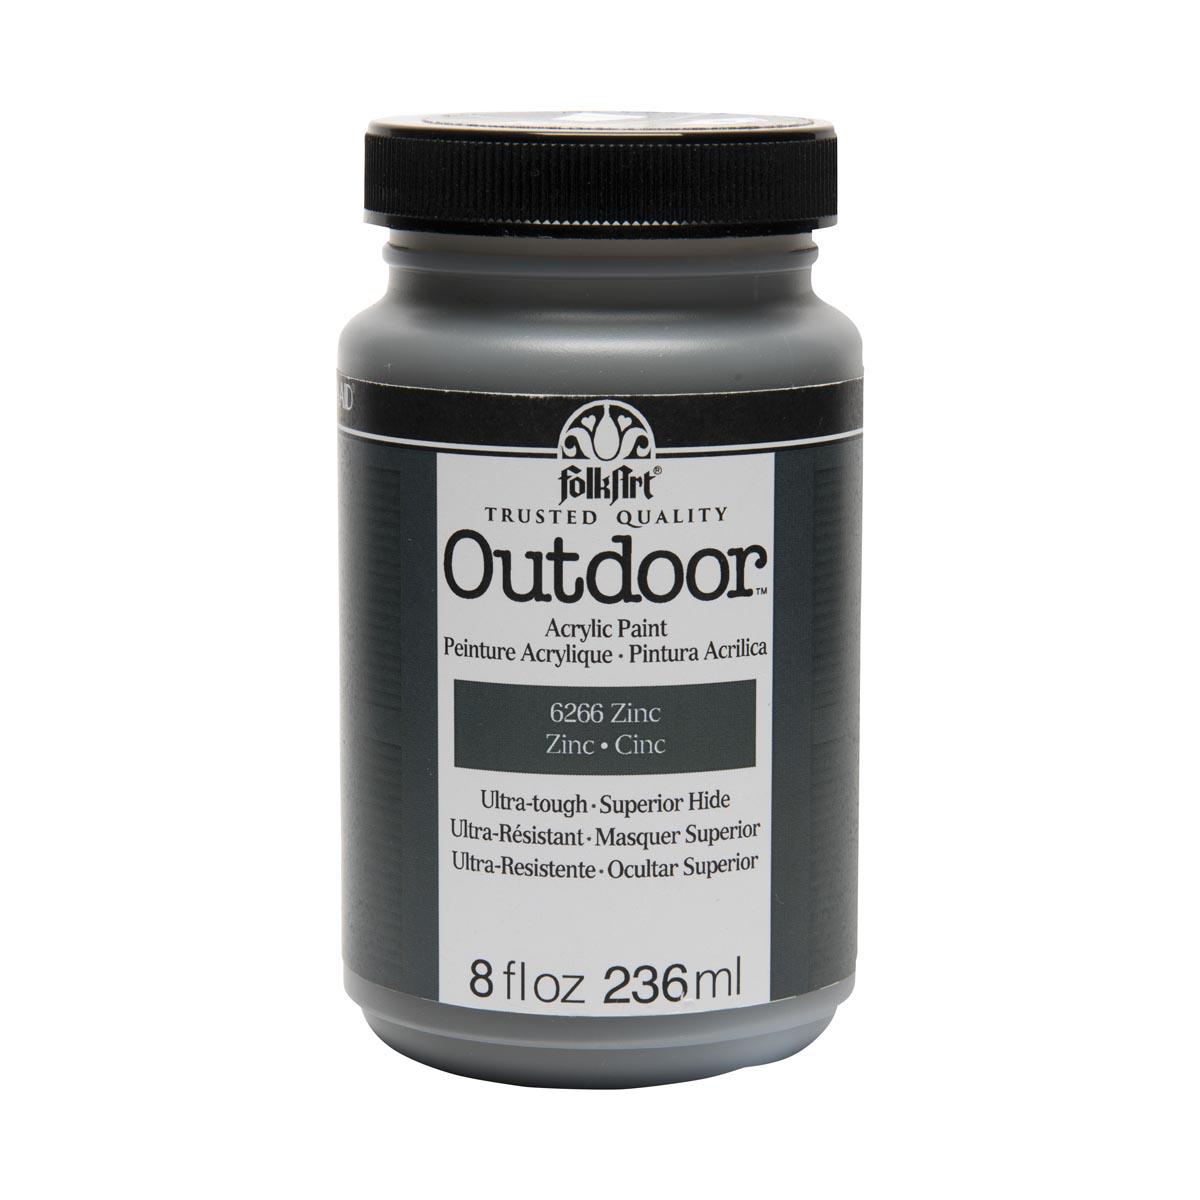 FolkArt ® Outdoor™ Acrylic Colors - Zinc, 8 oz. - 6266